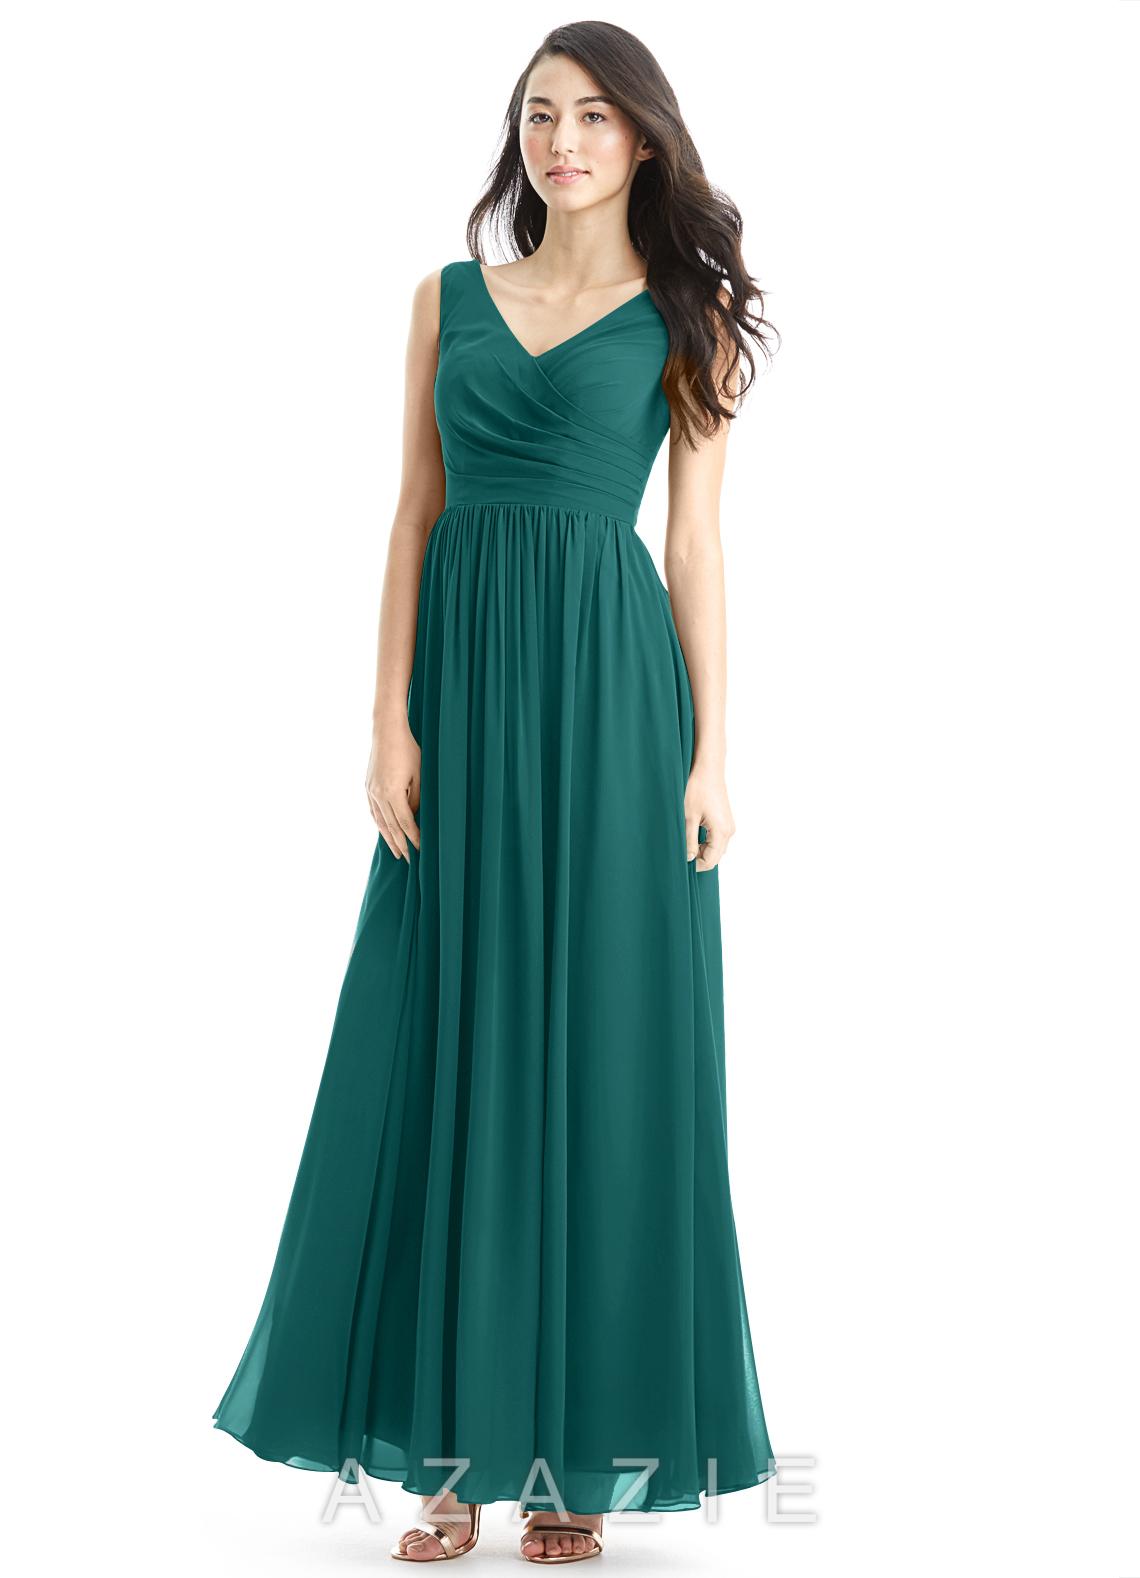 Azazie keyla bridesmaid dress azazie loading zoom ombrellifo Choice Image